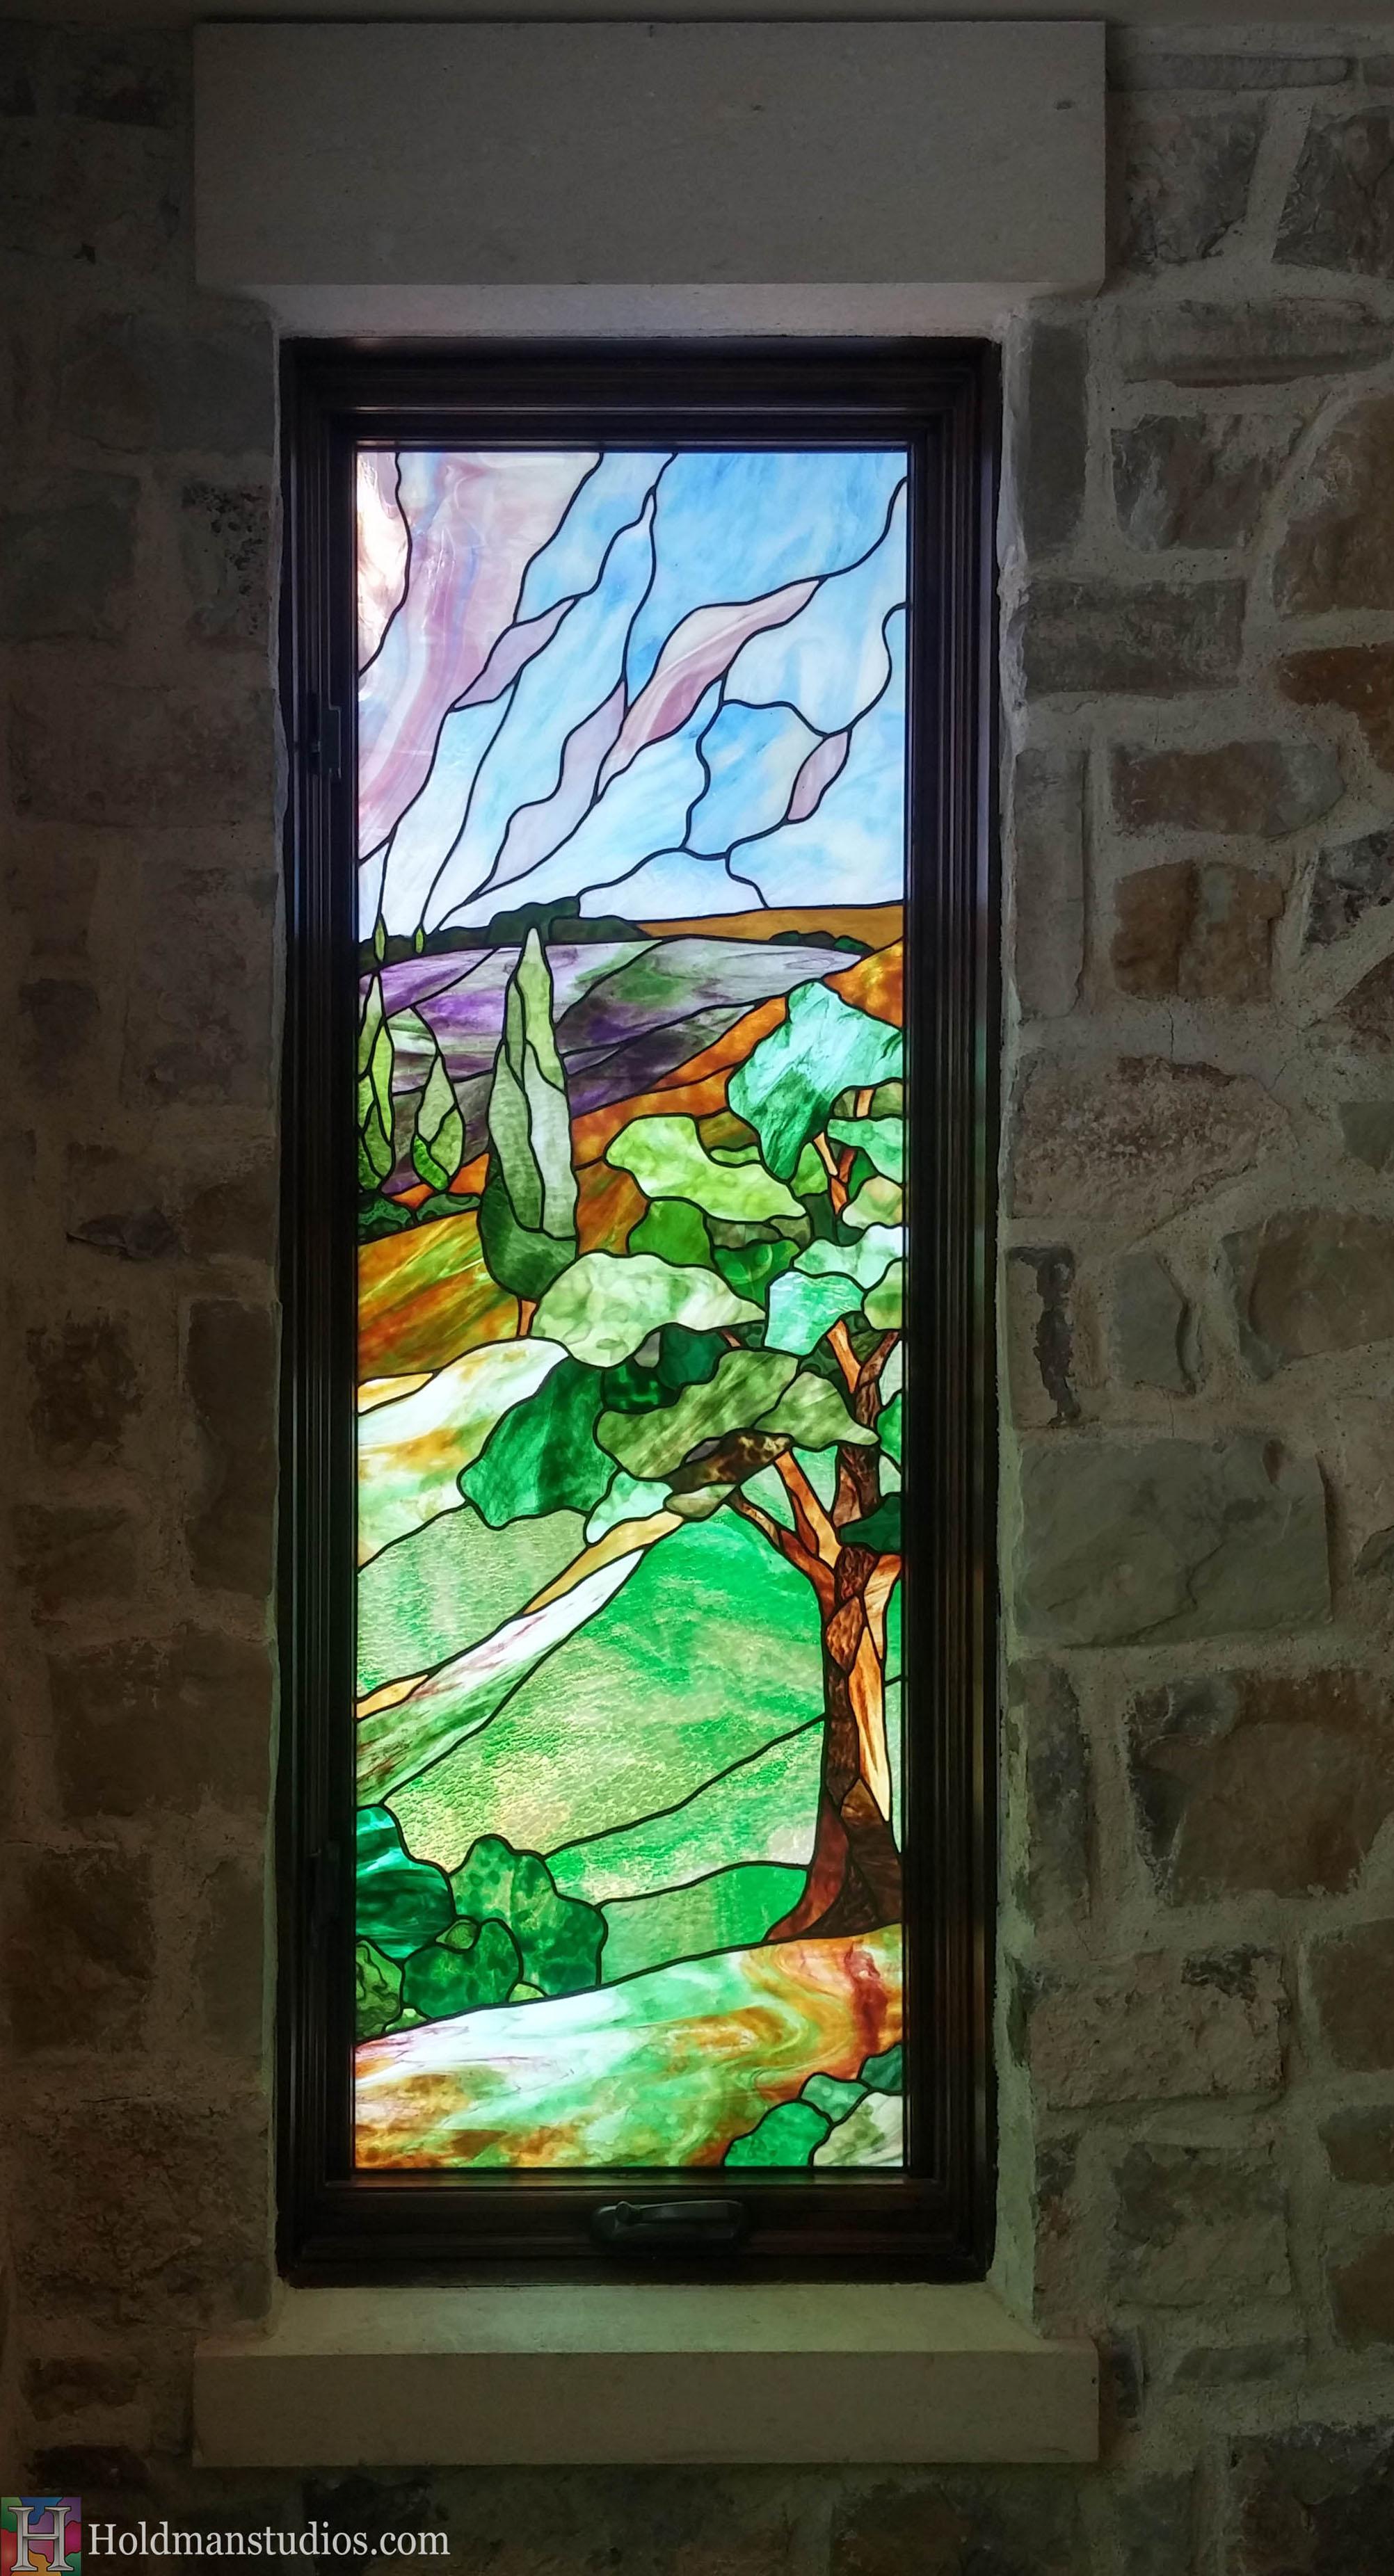 Holdman-Studios-Stained-Glass-Window-Landscape-Trees-Hill-Sky.jpg